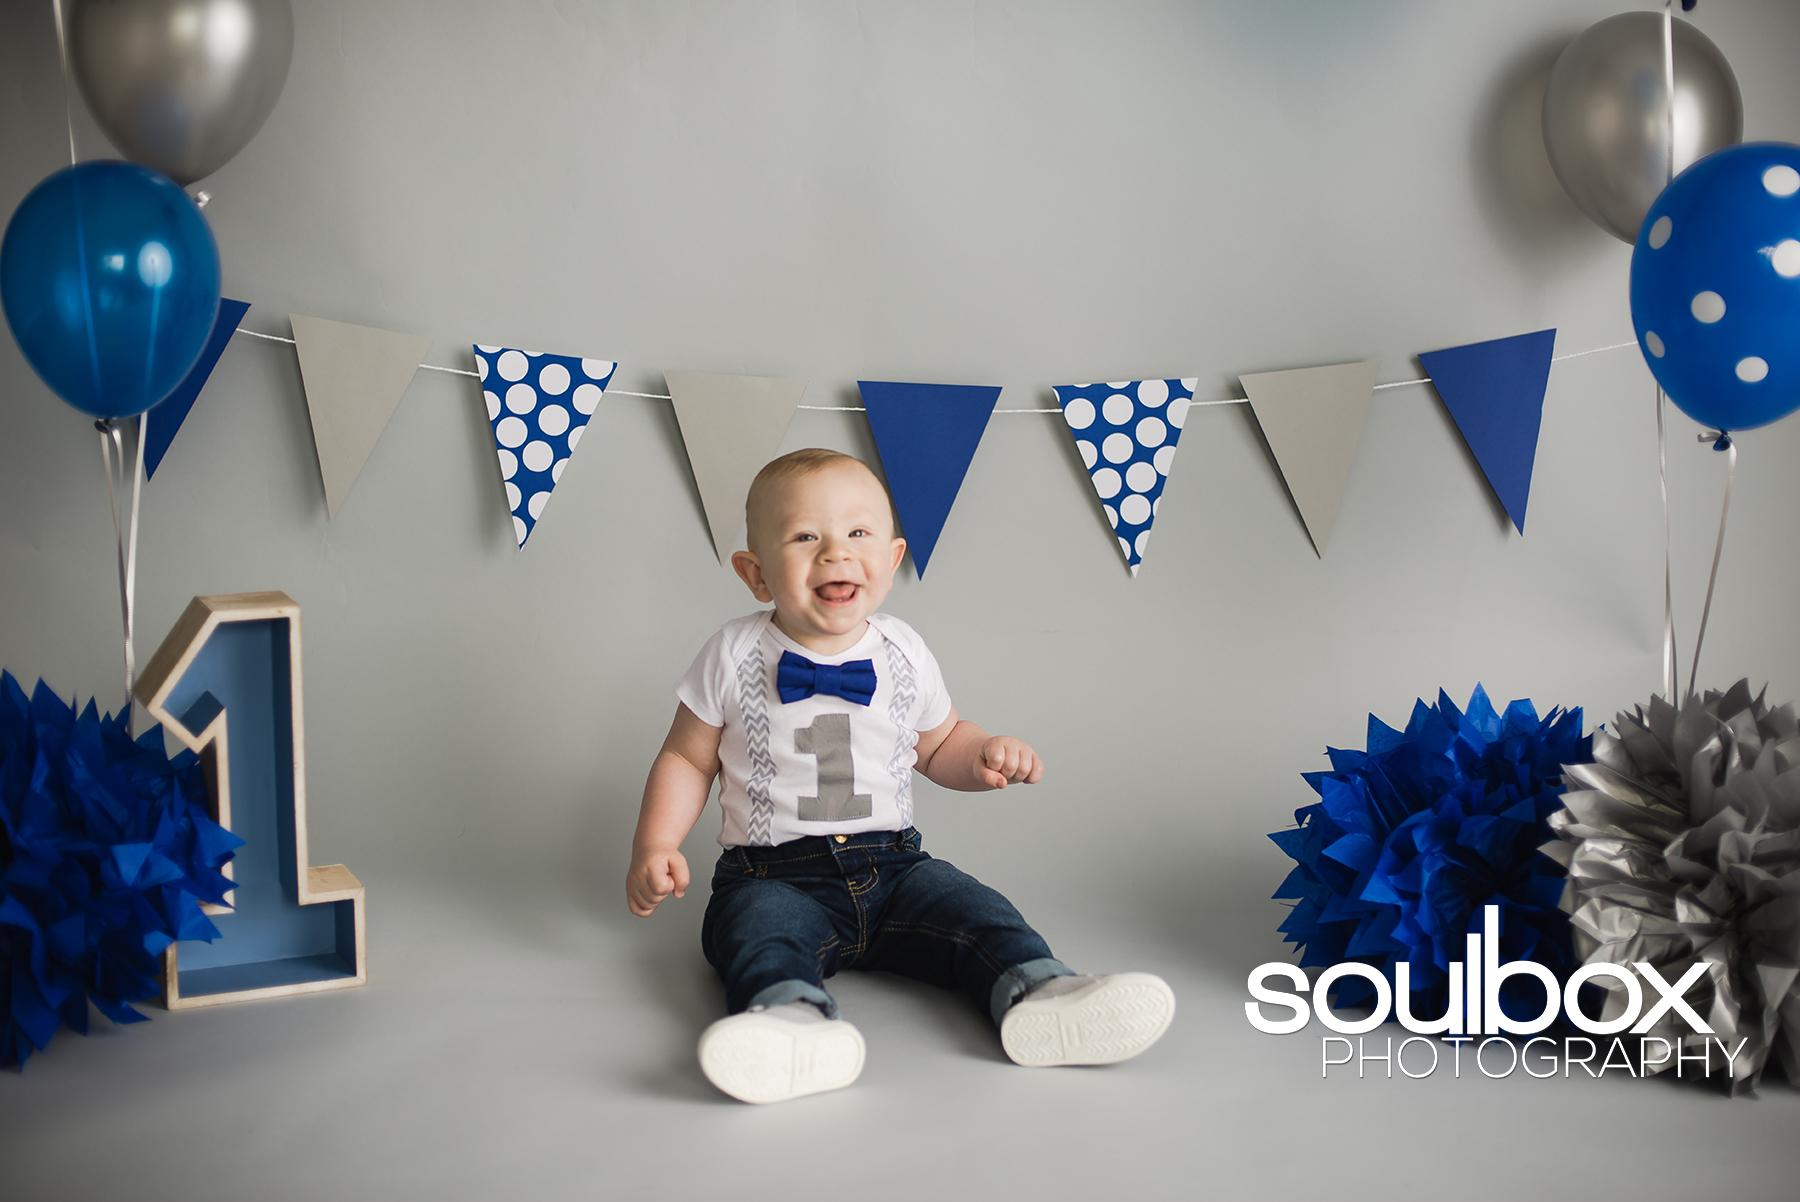 Soulbox Photography Children's Photography Cake Smash